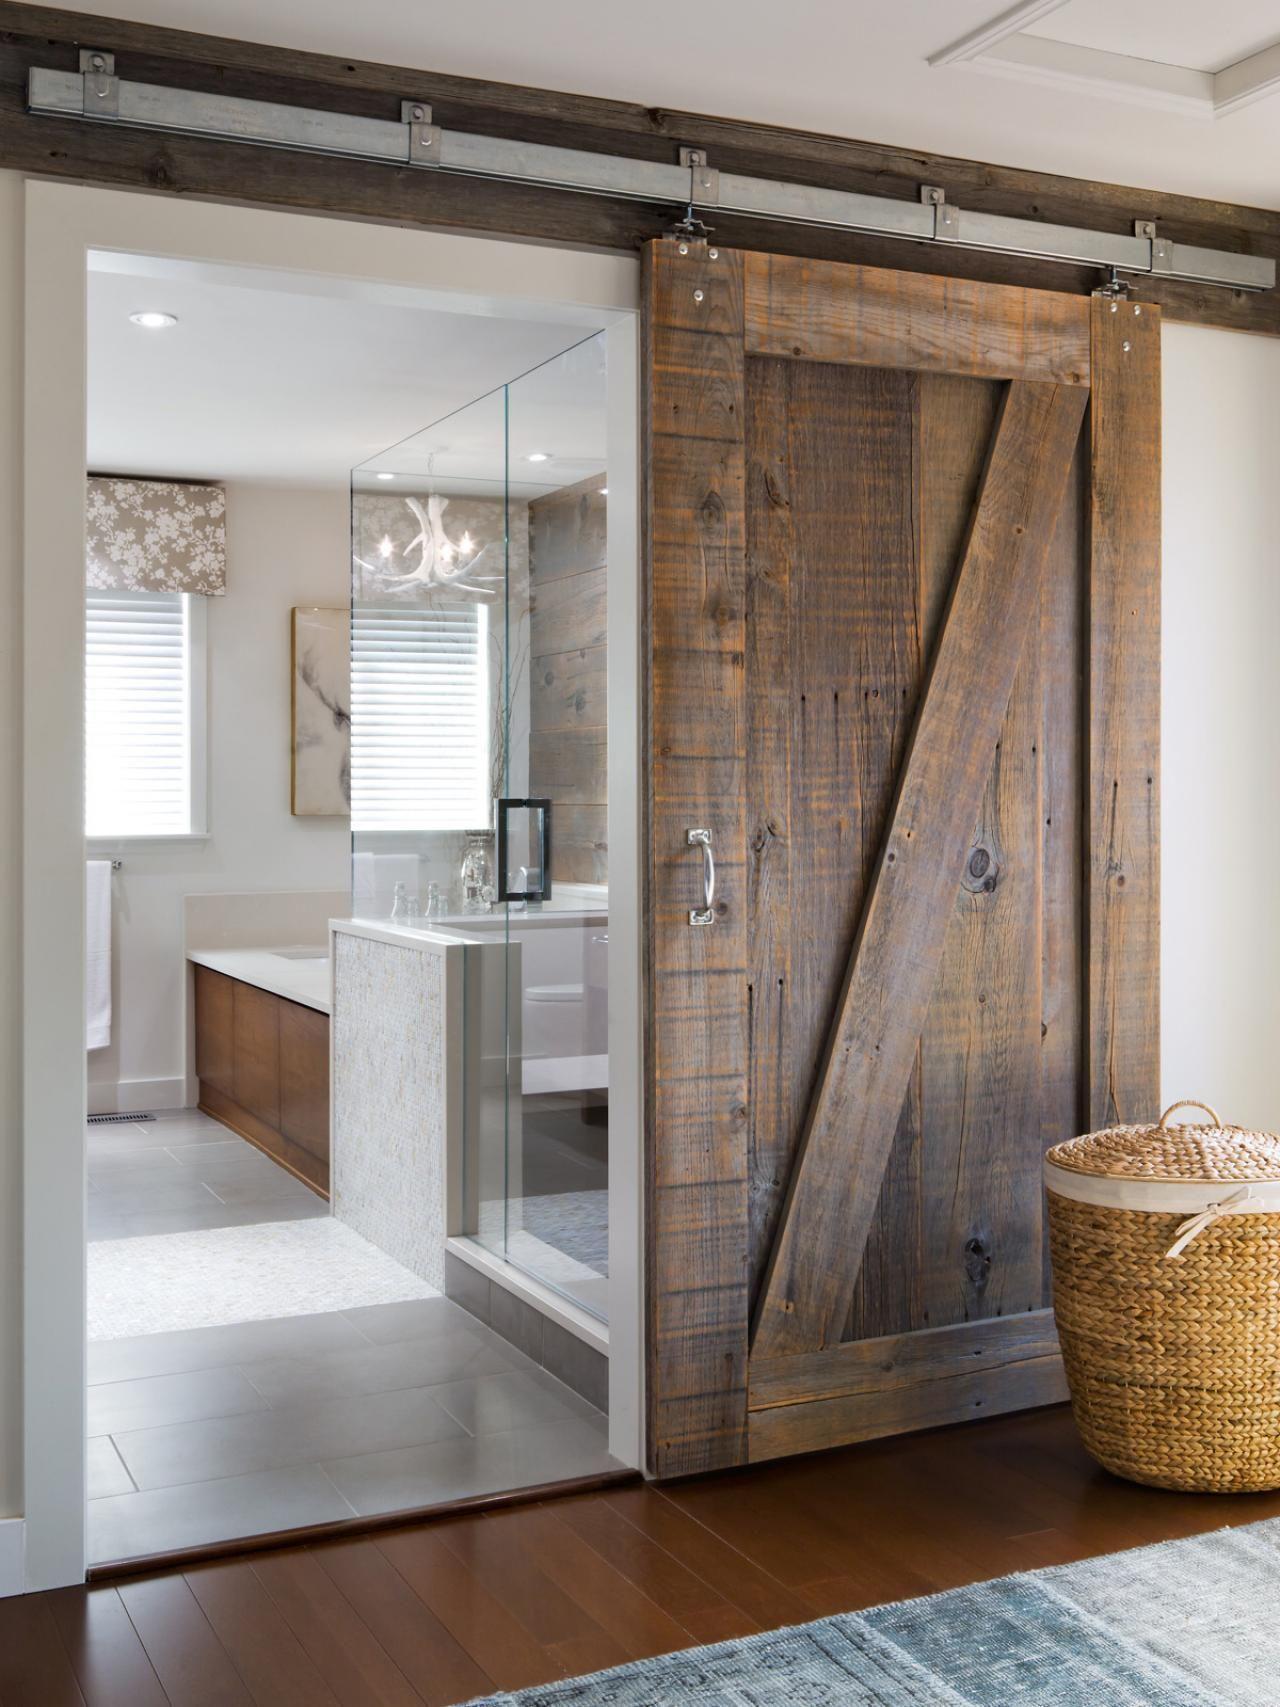 Barn door kits for bathrooms - Barn Door Design Ideas